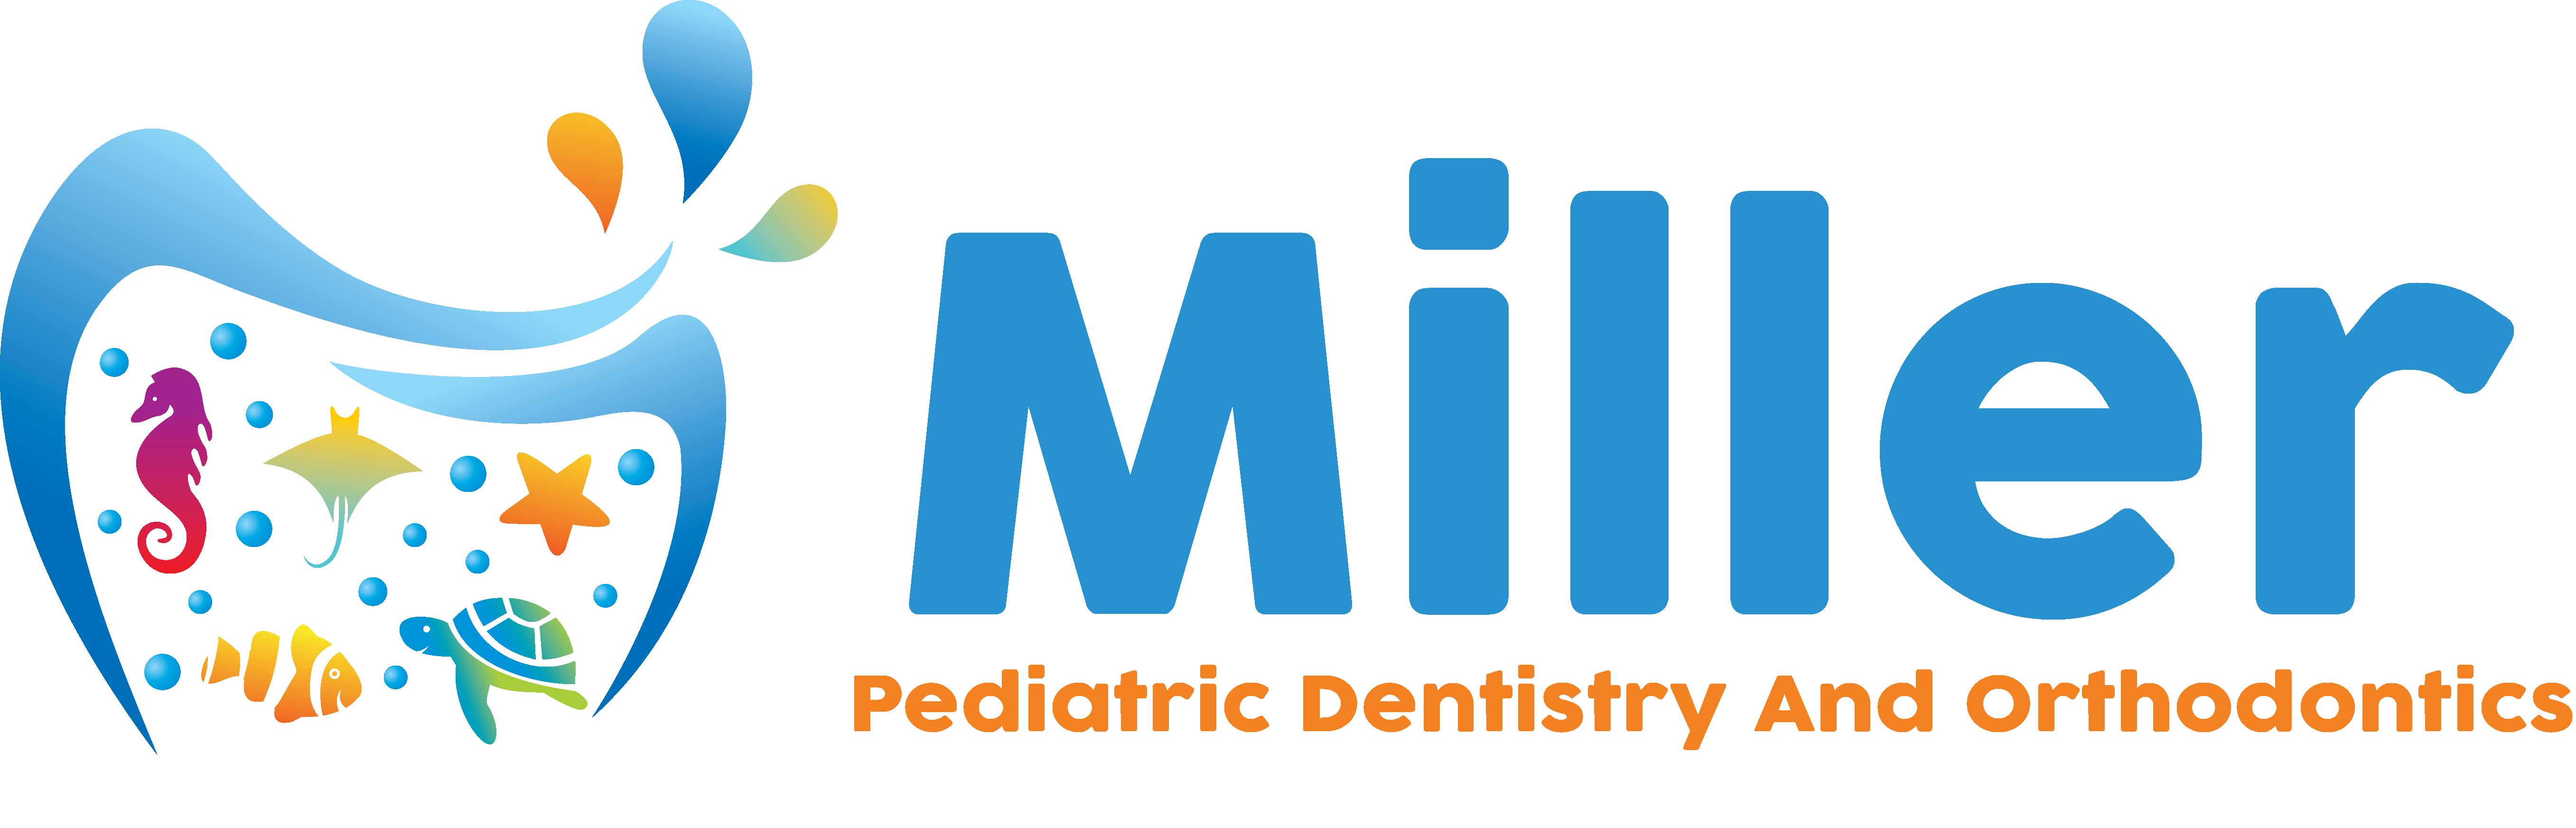 Design a fun ocean themed logo for a children's dental office